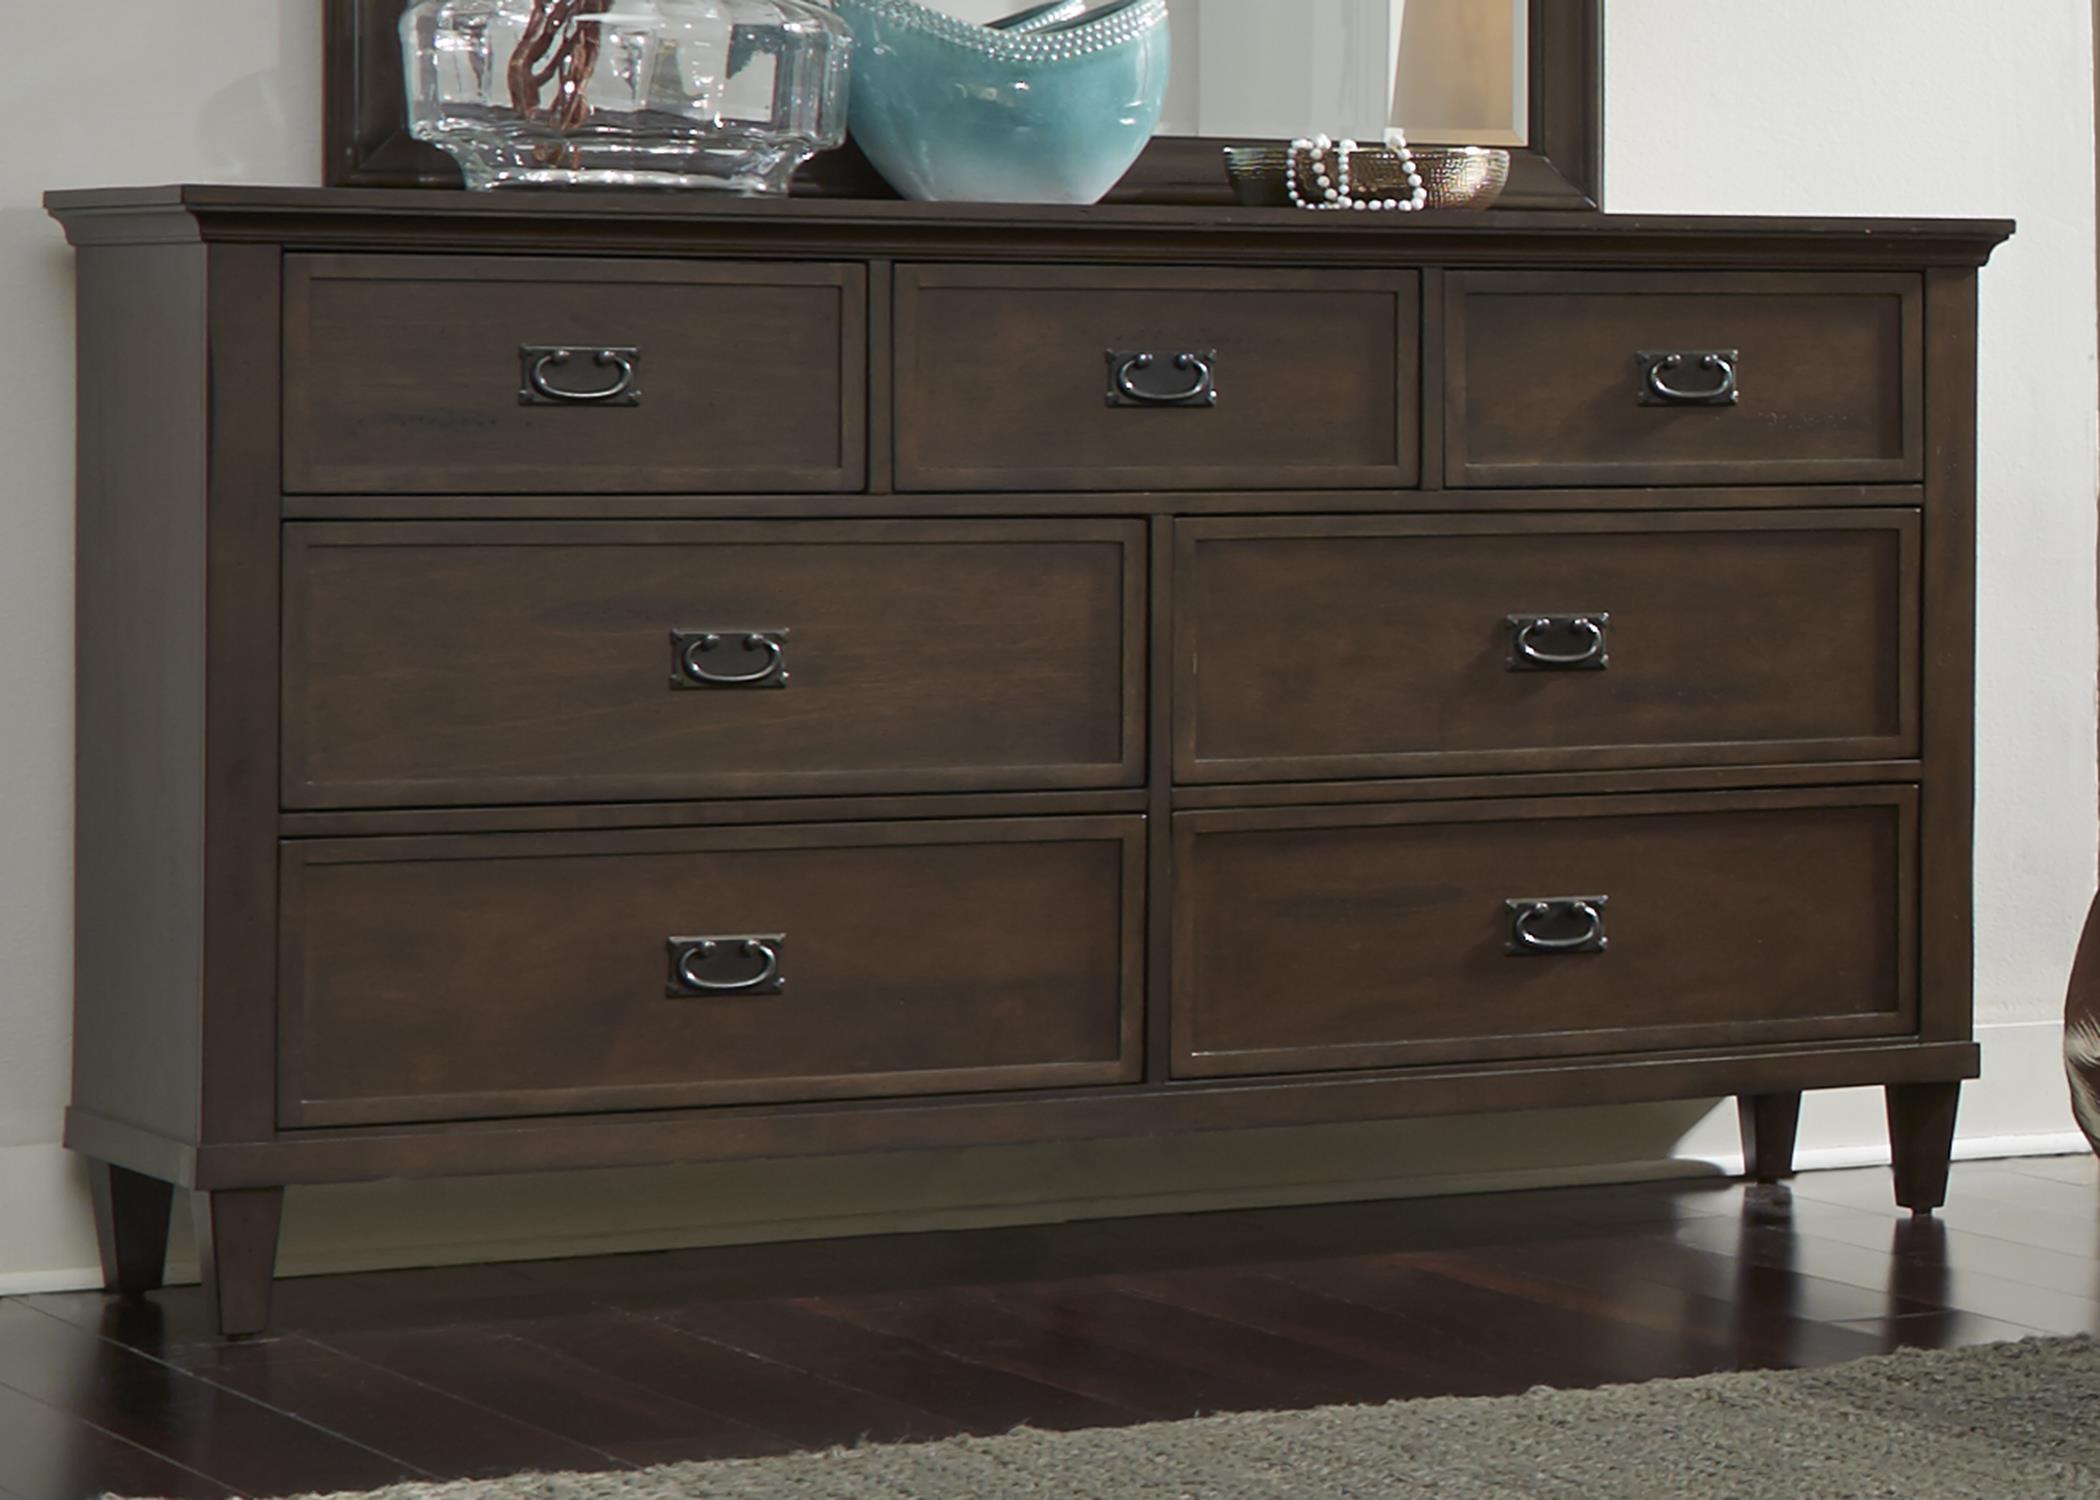 Liberty Furniture Berkley Heights 7 Drawer Dresser - Item Number: 102-BR31